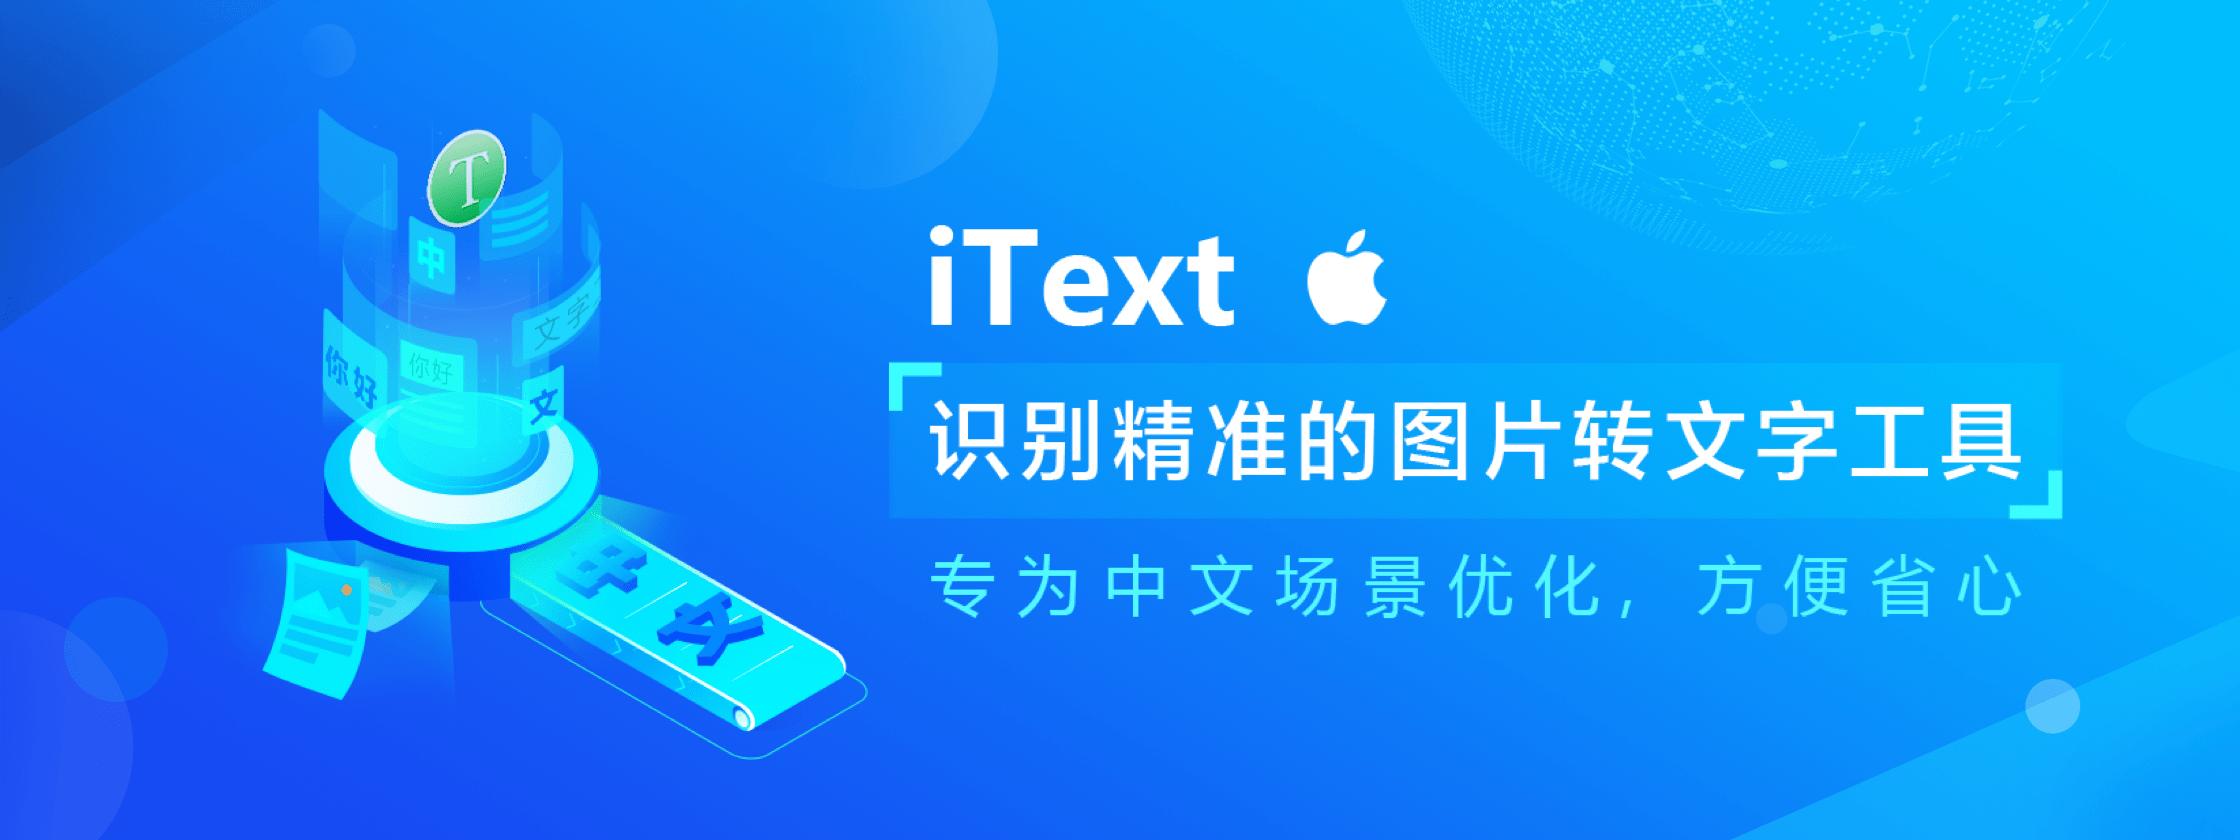 iText – 轻巧精准的 OCR 识别工具